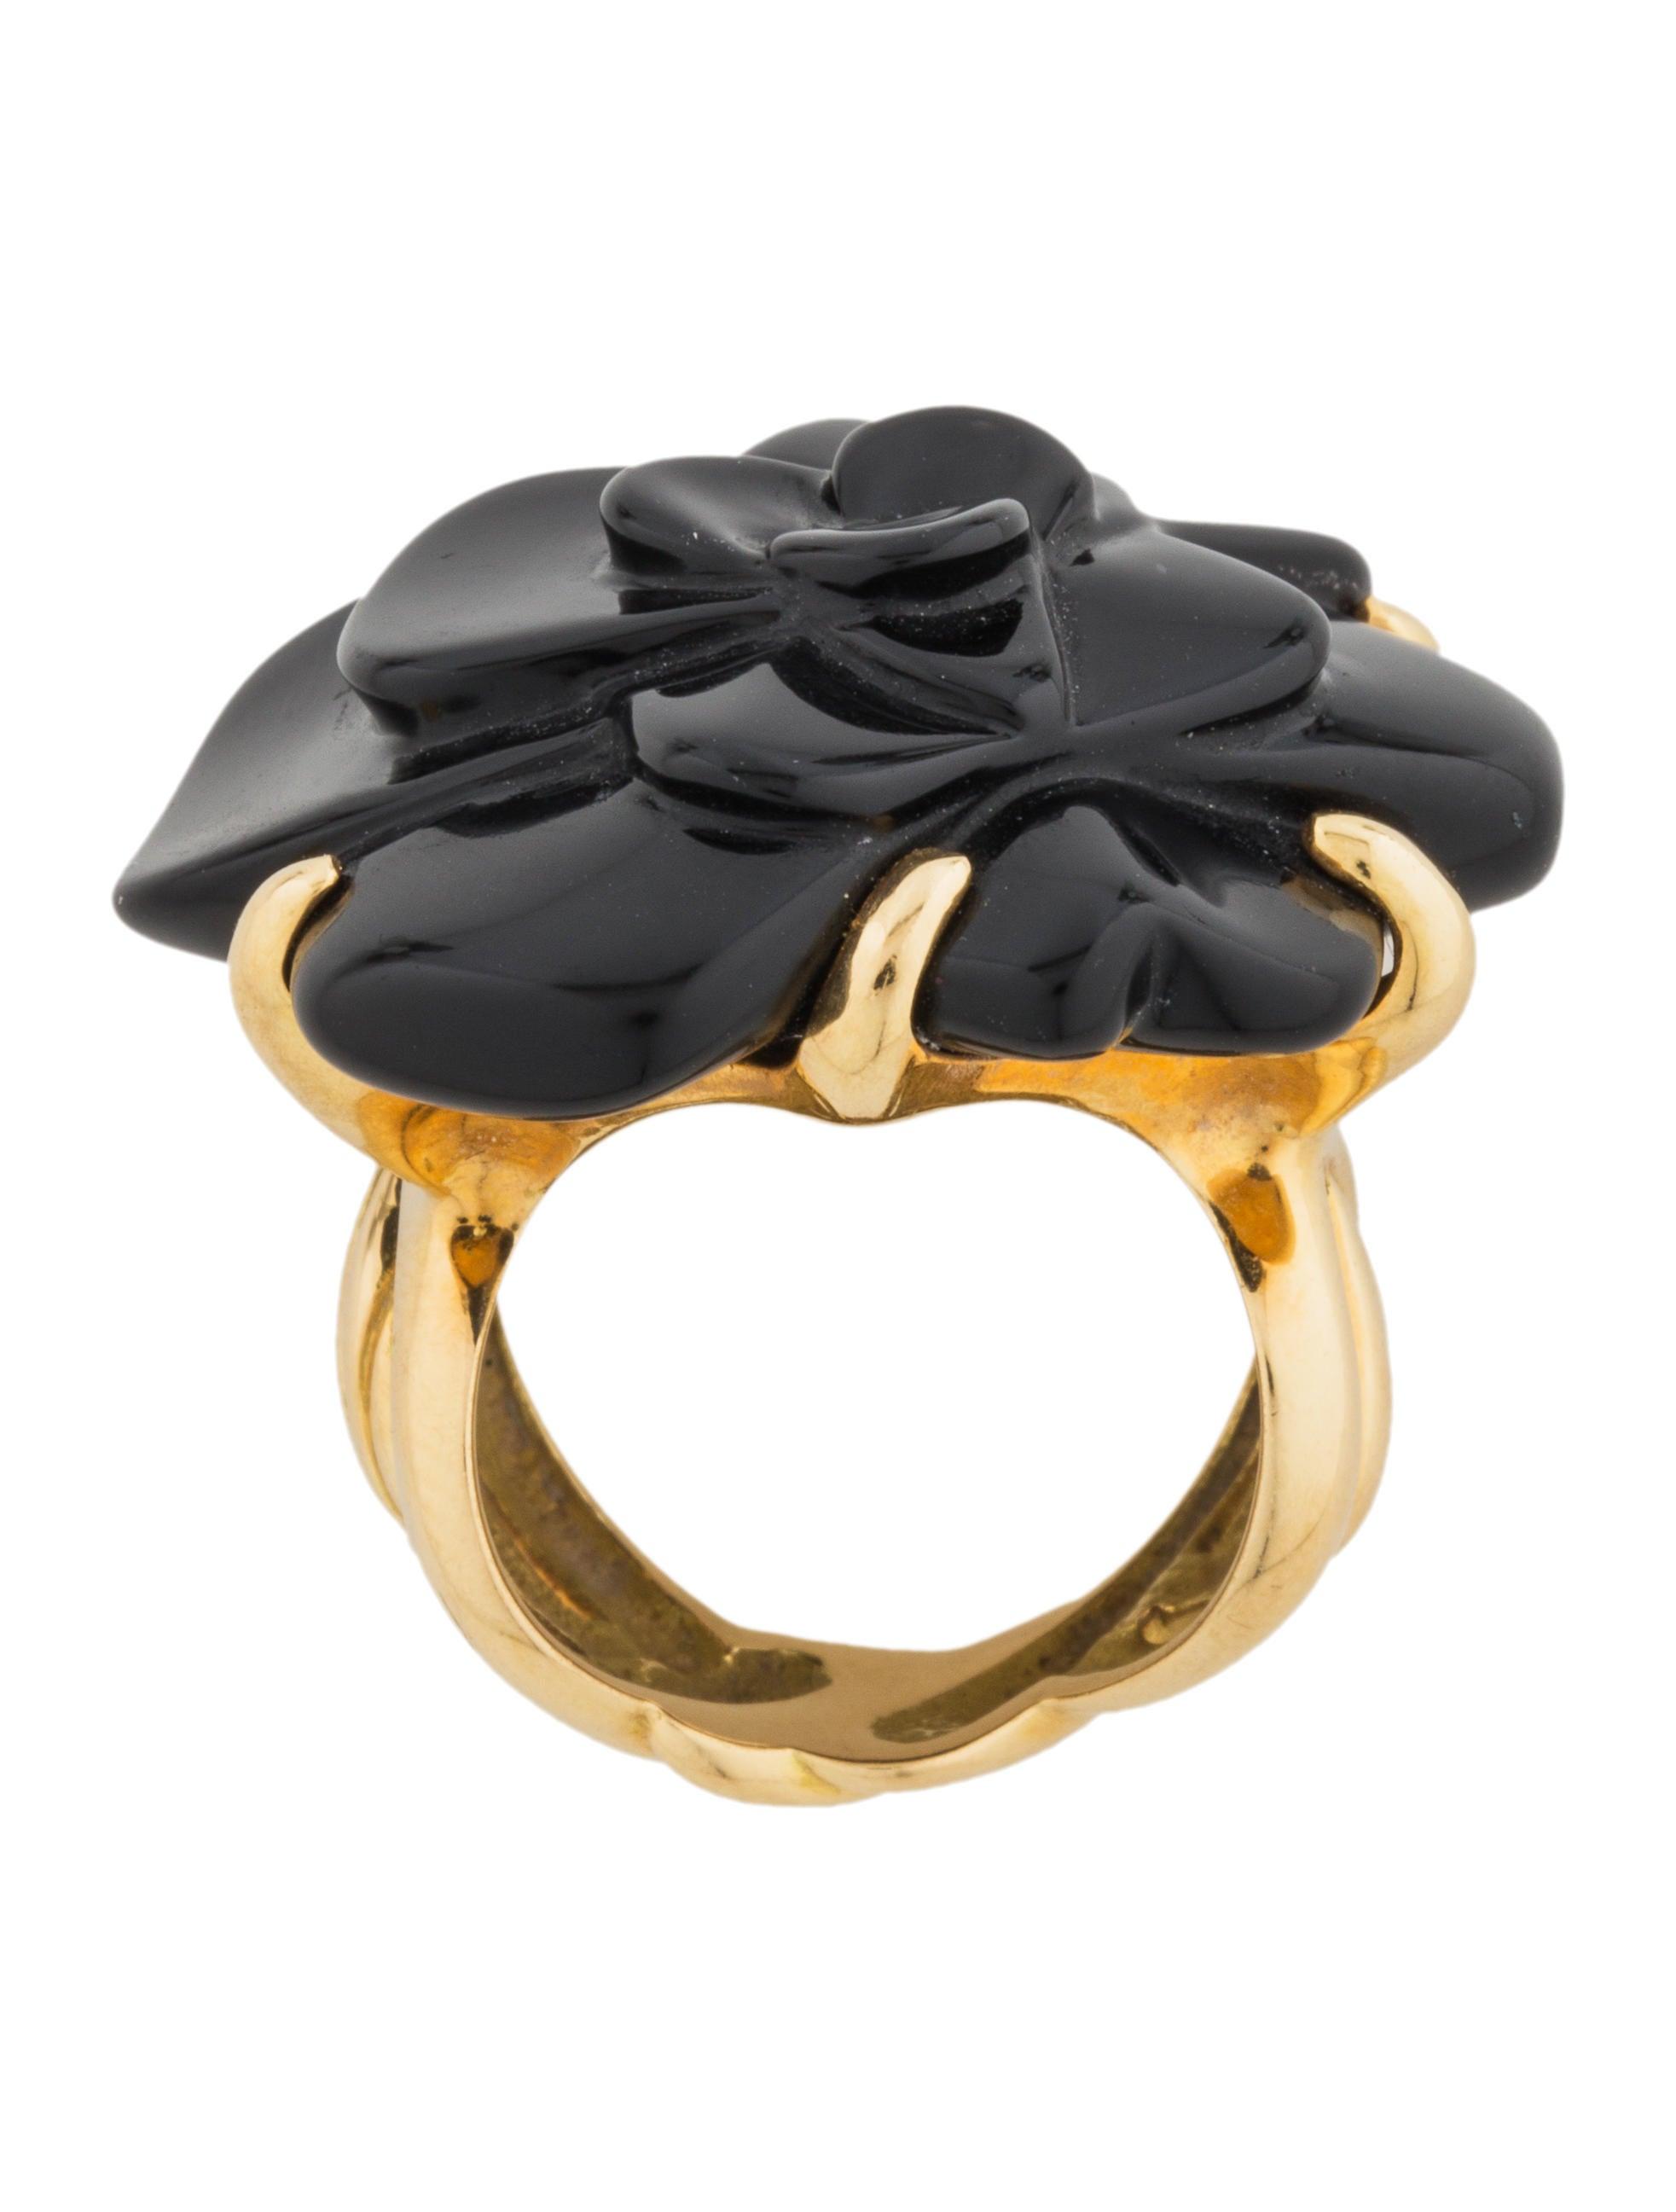 Chanel Camelia Onyx Ring